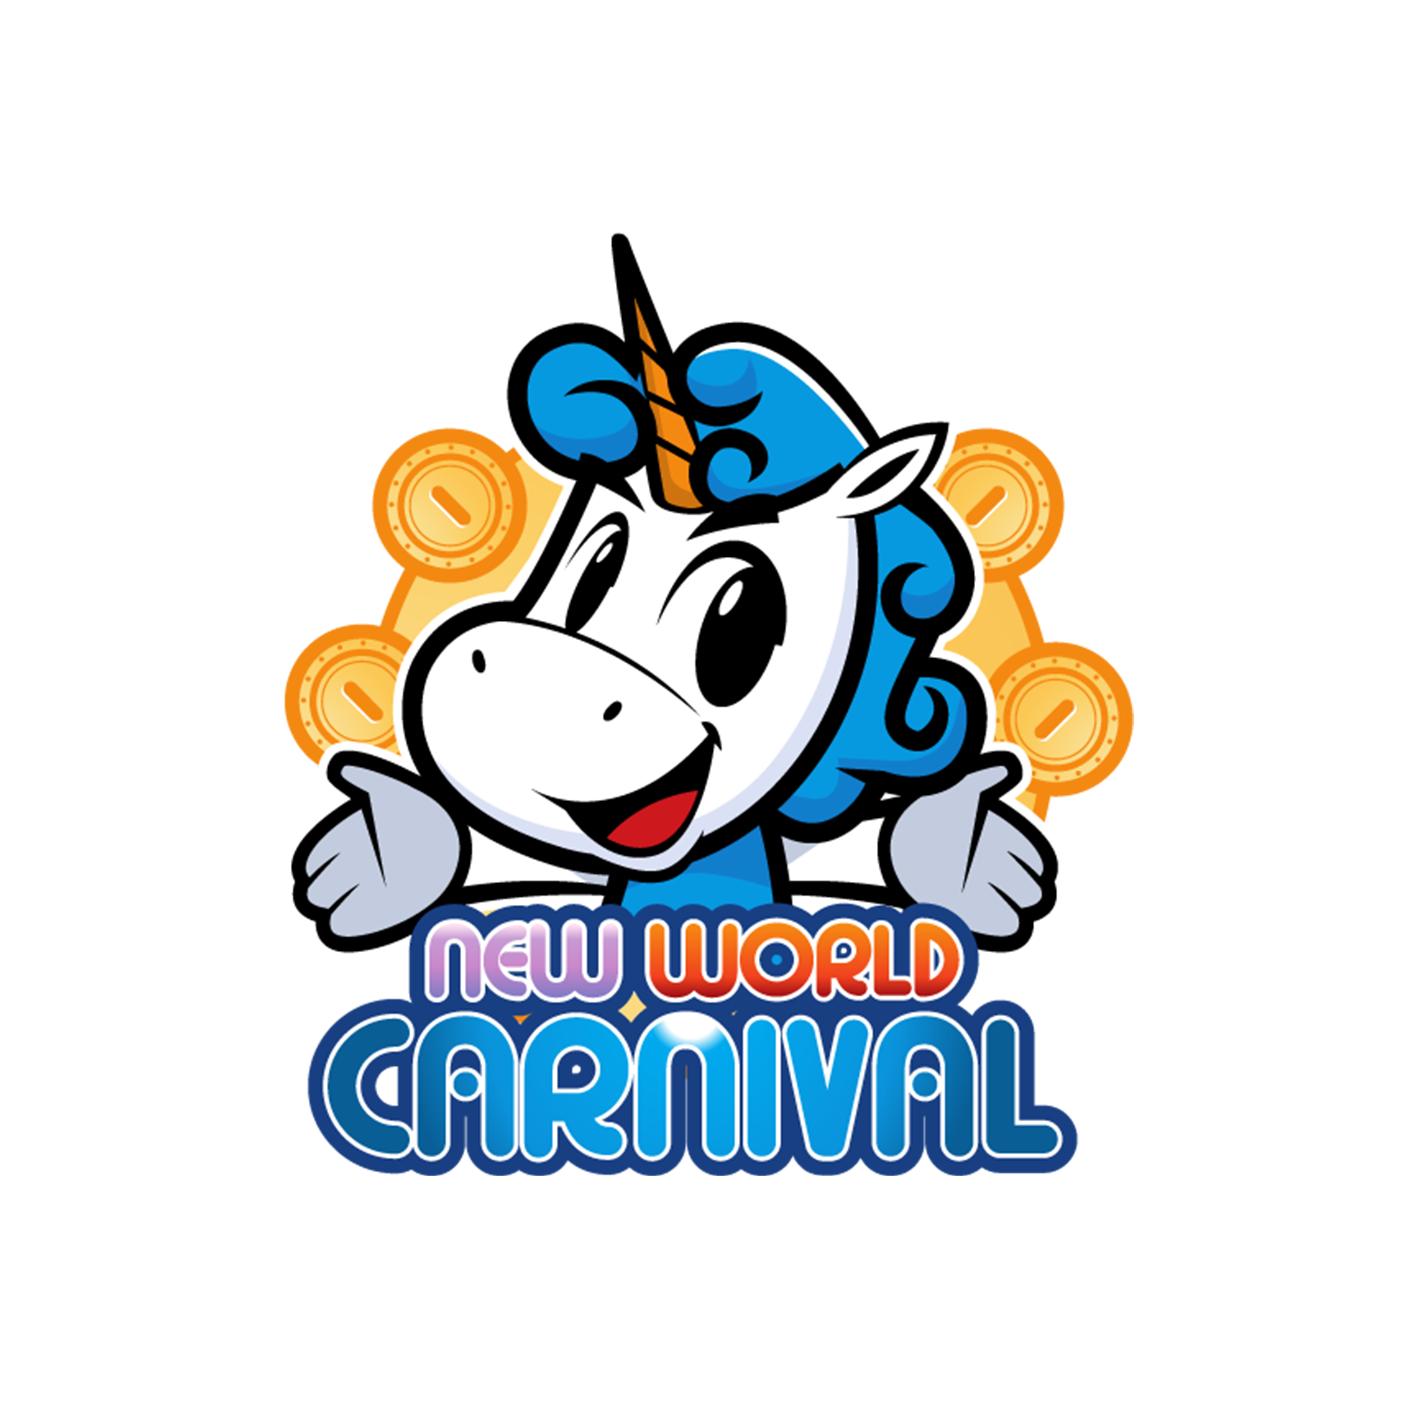 New World Carnival (Marina Square) - Dine, Shop, Earn